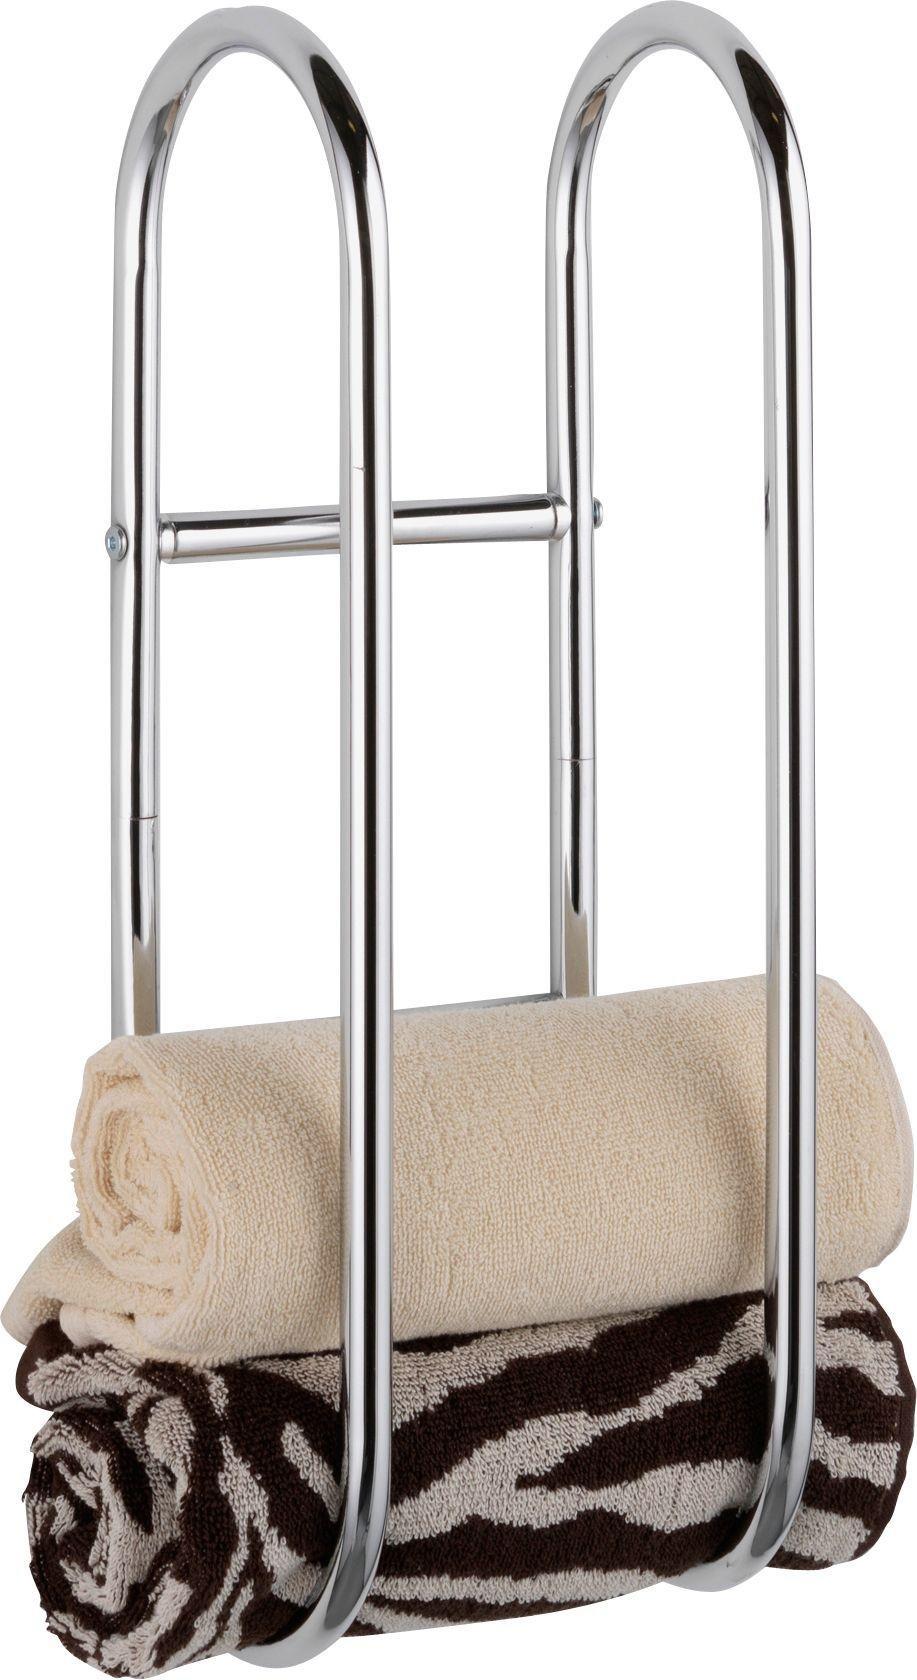 Argos Home Wall Mounted Chrome Towel Holder